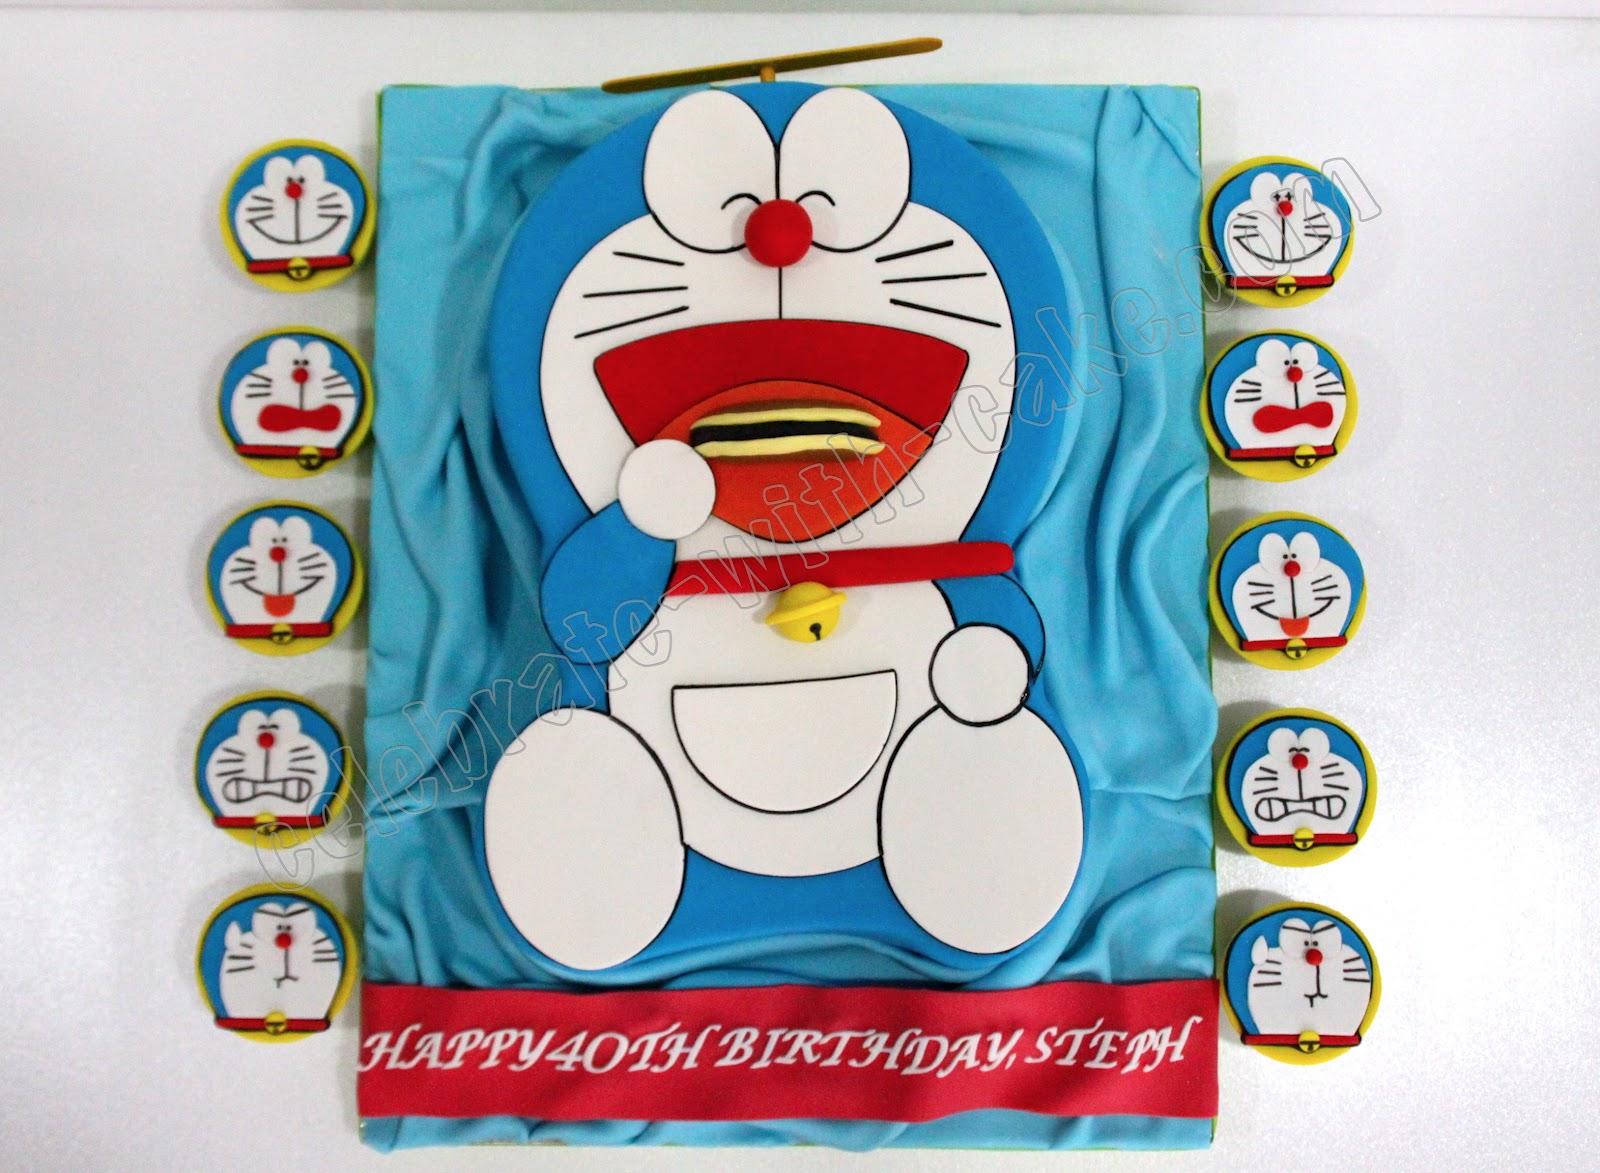 Doraemon Images For Cake : Celebrate with Cake!: Doraemon Cake